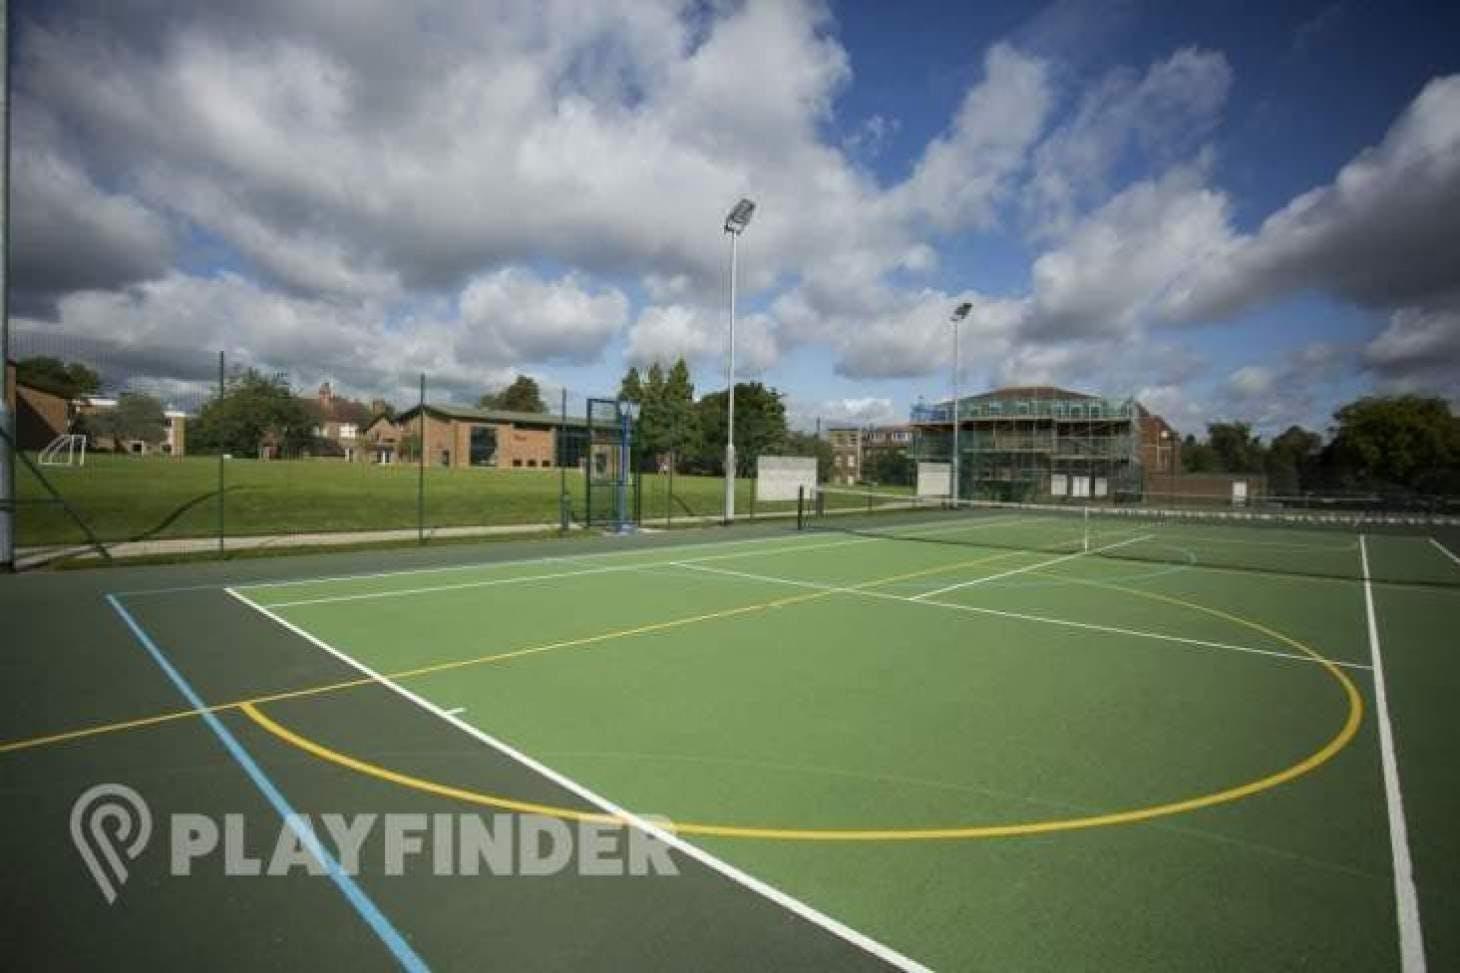 St Helen's Sports Complex Outdoor | Hard (macadam) tennis court